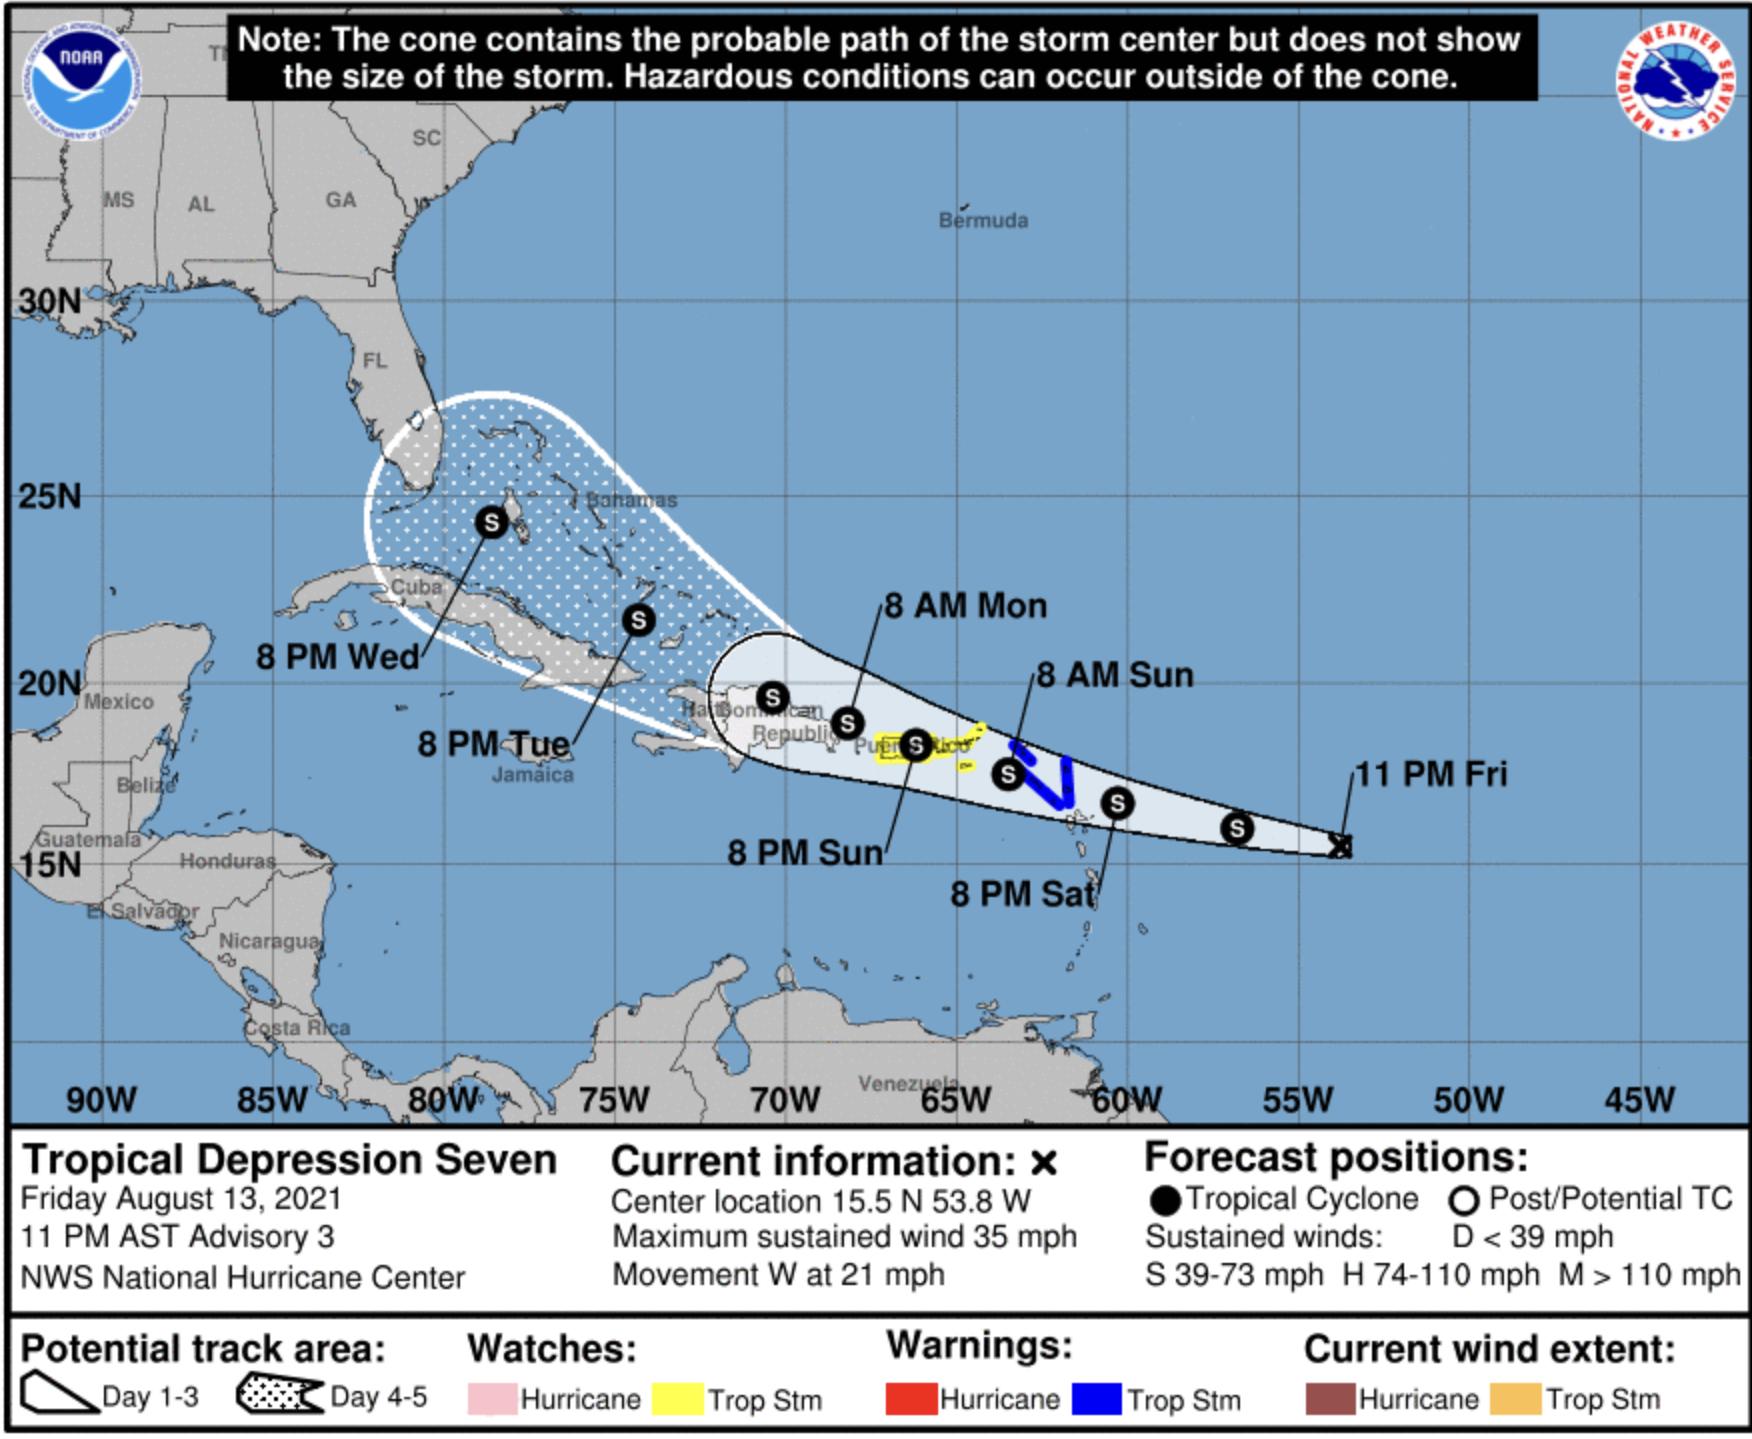 Tropical depression 7